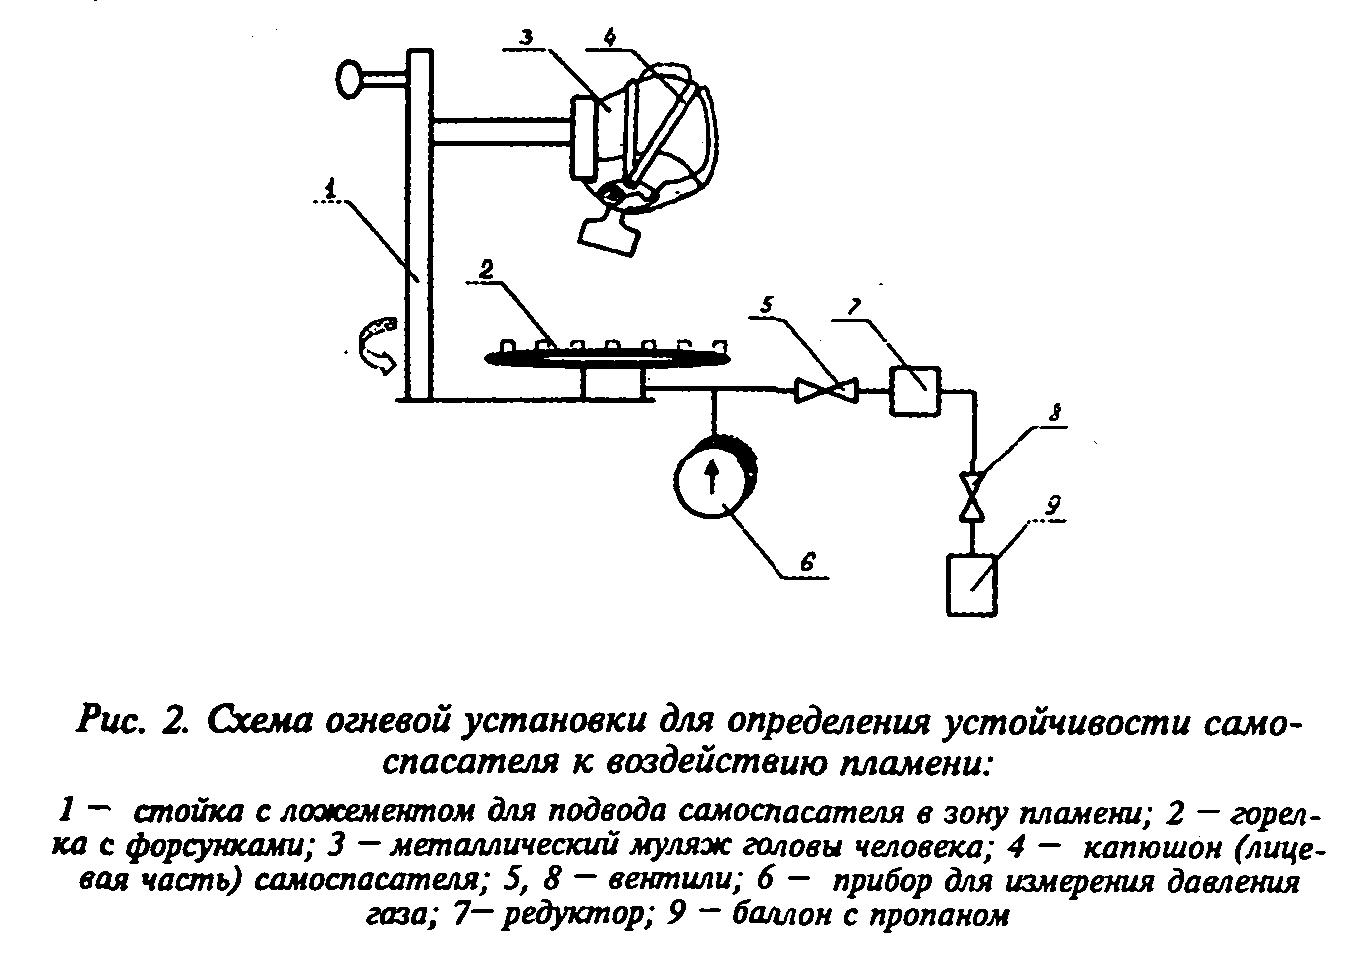 РИС. 2 К НПБ 302-2001